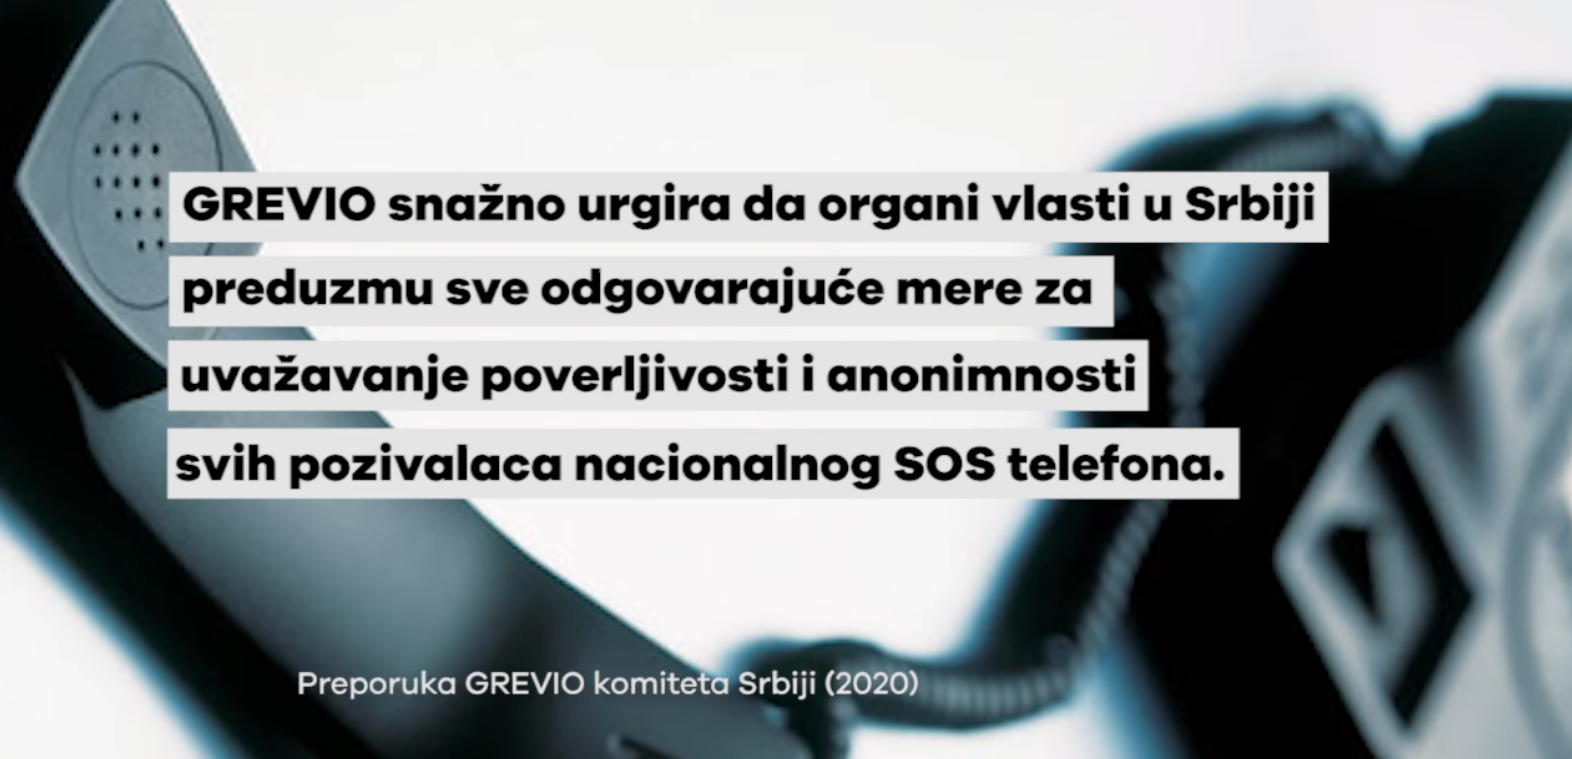 feminizam aktivizam SOS telefon grevio